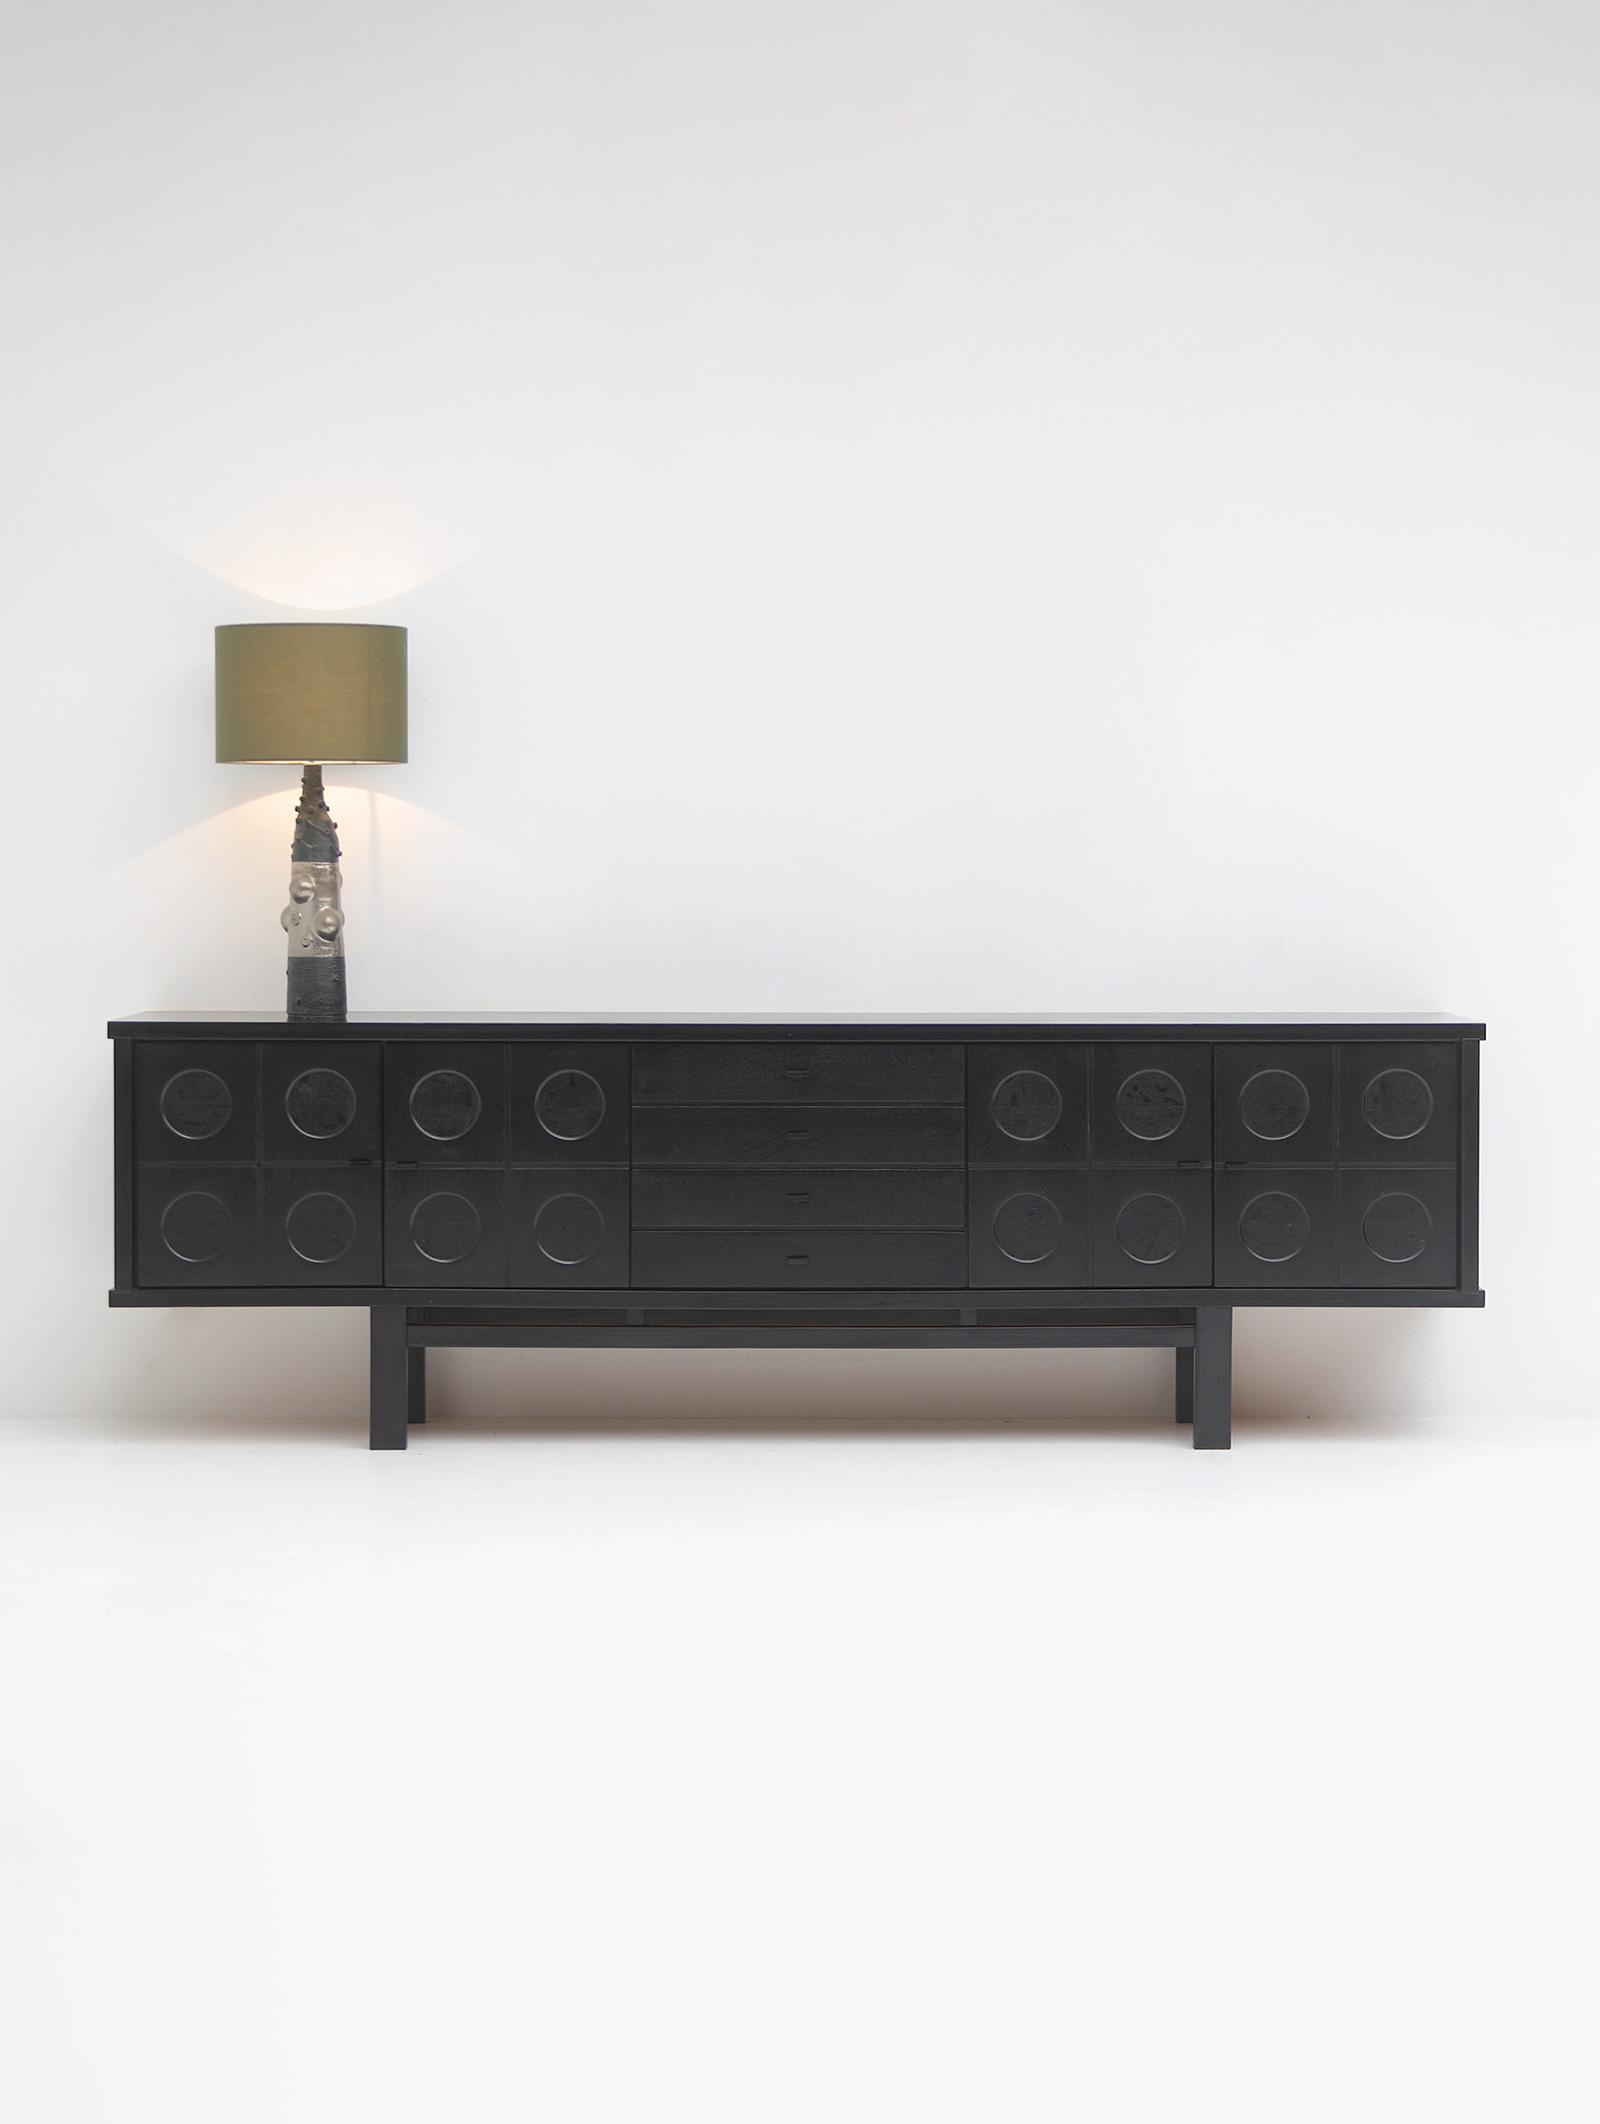 70s Sideboard with Geometrical Doorsimage 1